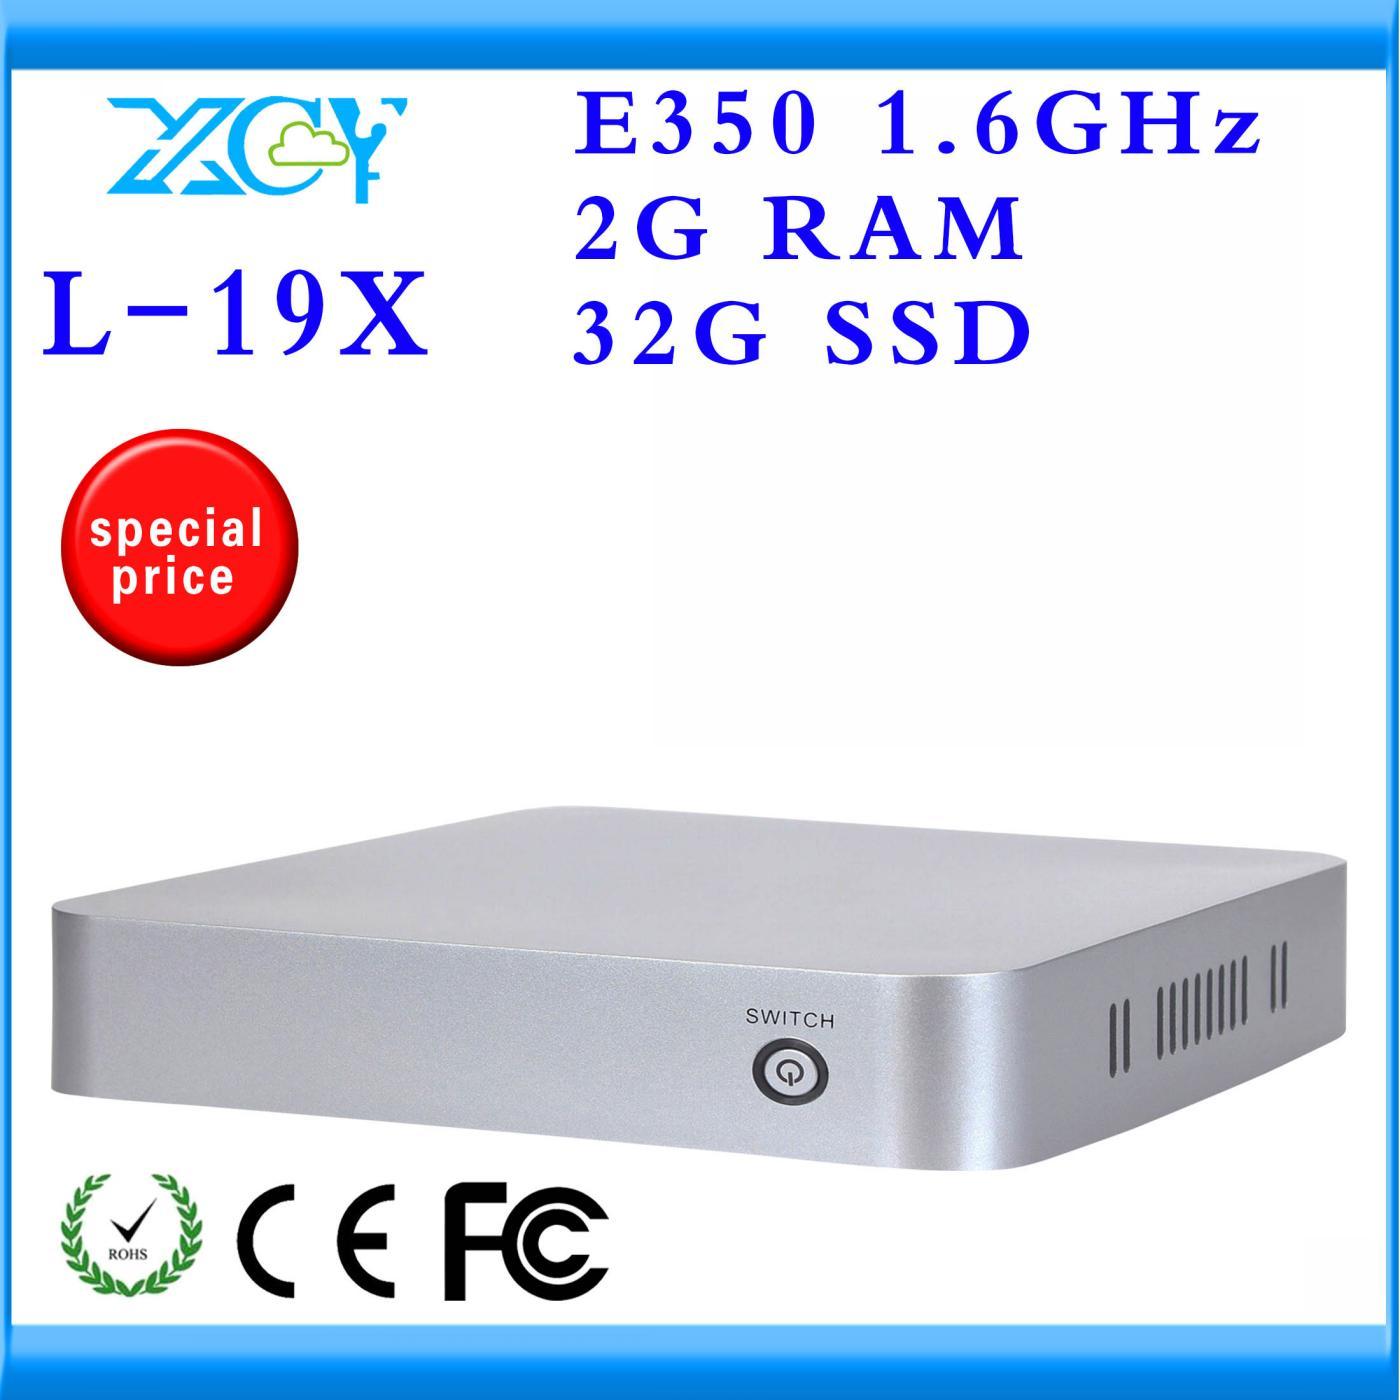 XCY Cheap Mini Desktop PC AMD E350 Dual core 1.6GHZ Computer Desktop PC 32GB SSD 2G RAM Support youtube video chat Net pc(China (Mainland))